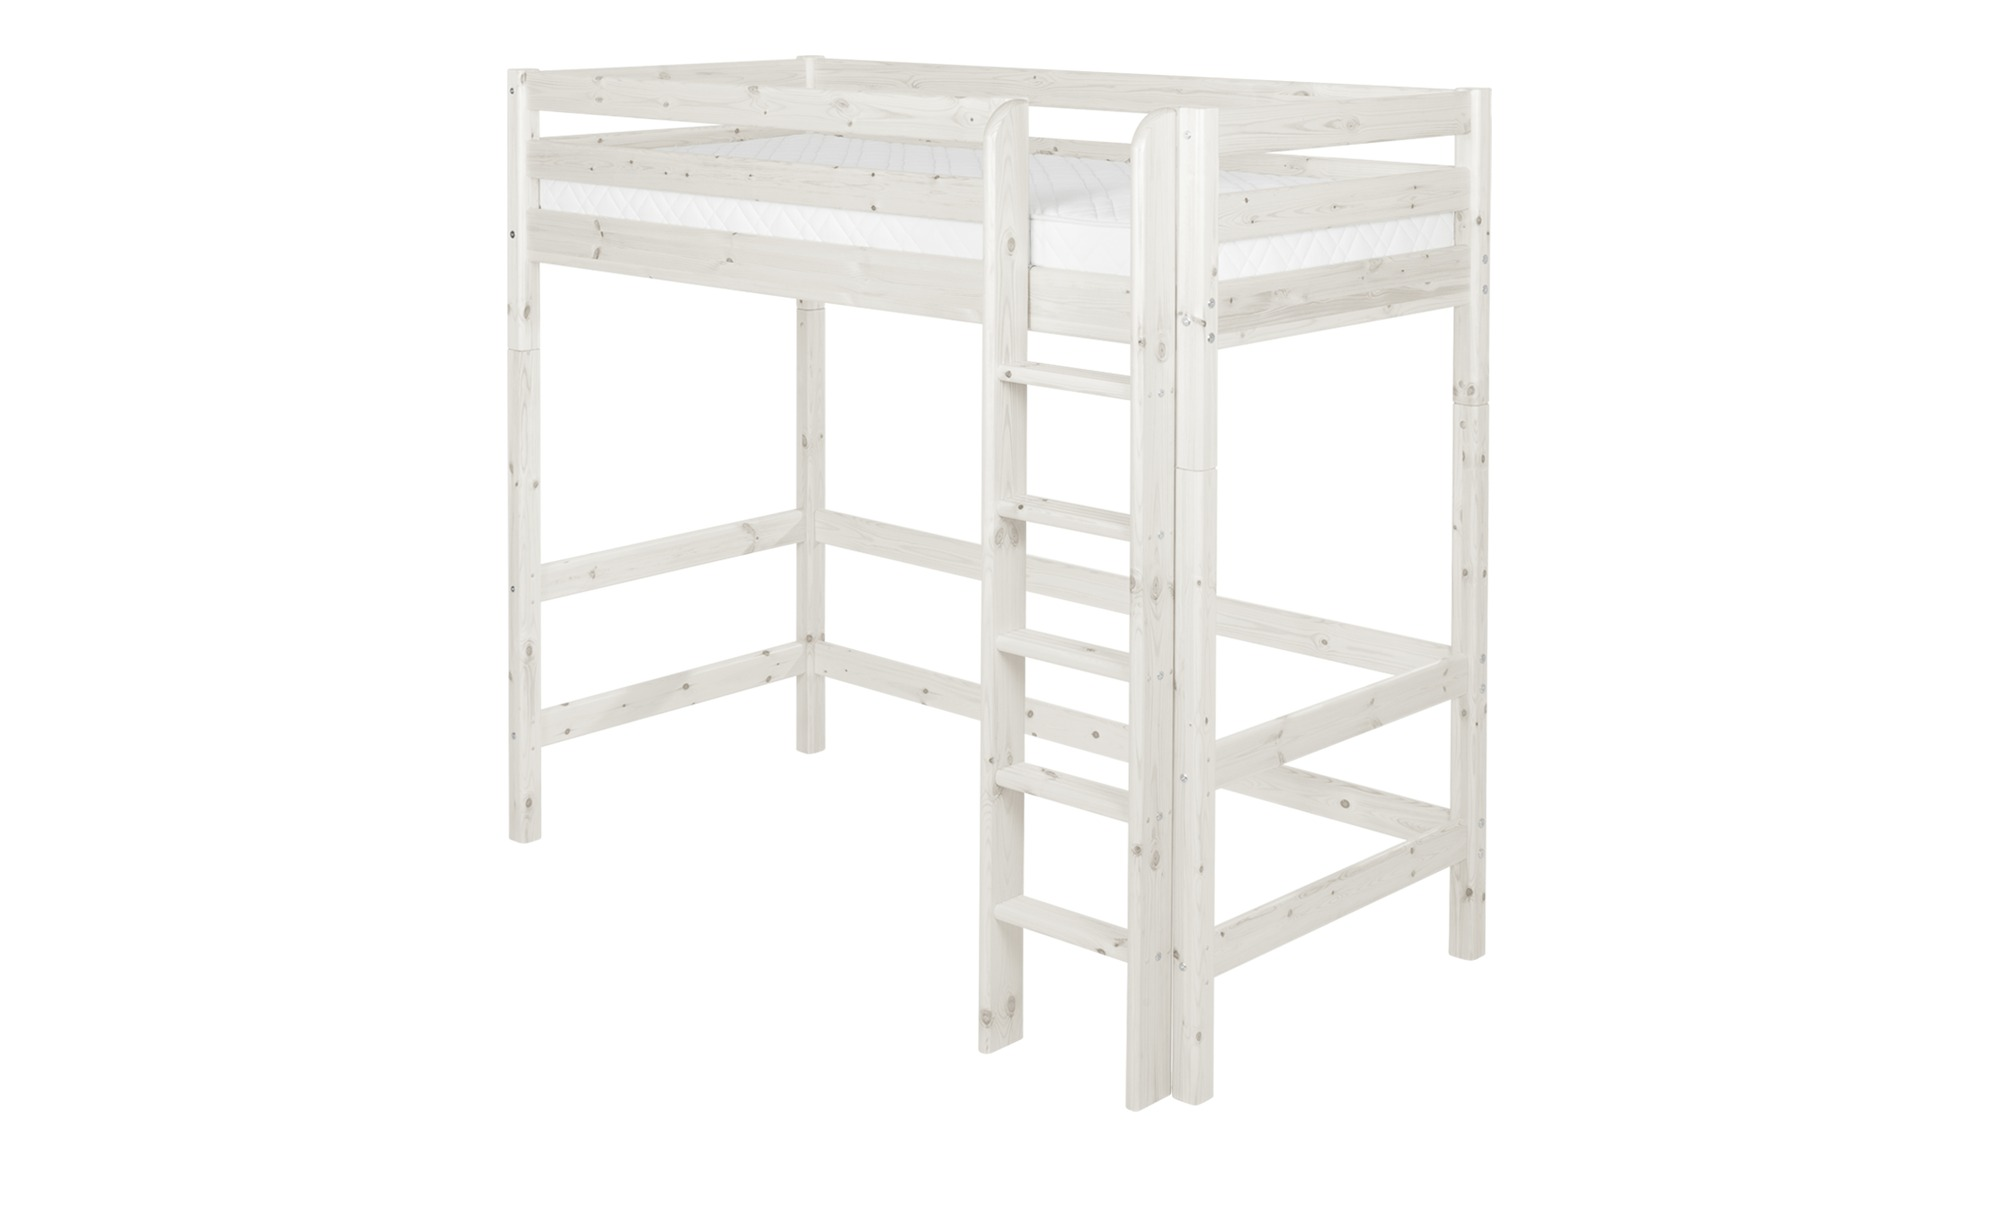 FLEXA Hochbett  Flexa Classic - weiß - 110 cm - 185 cm - Kindermöbel > Kinderbetten > Hochbetten - Möbel Kraft